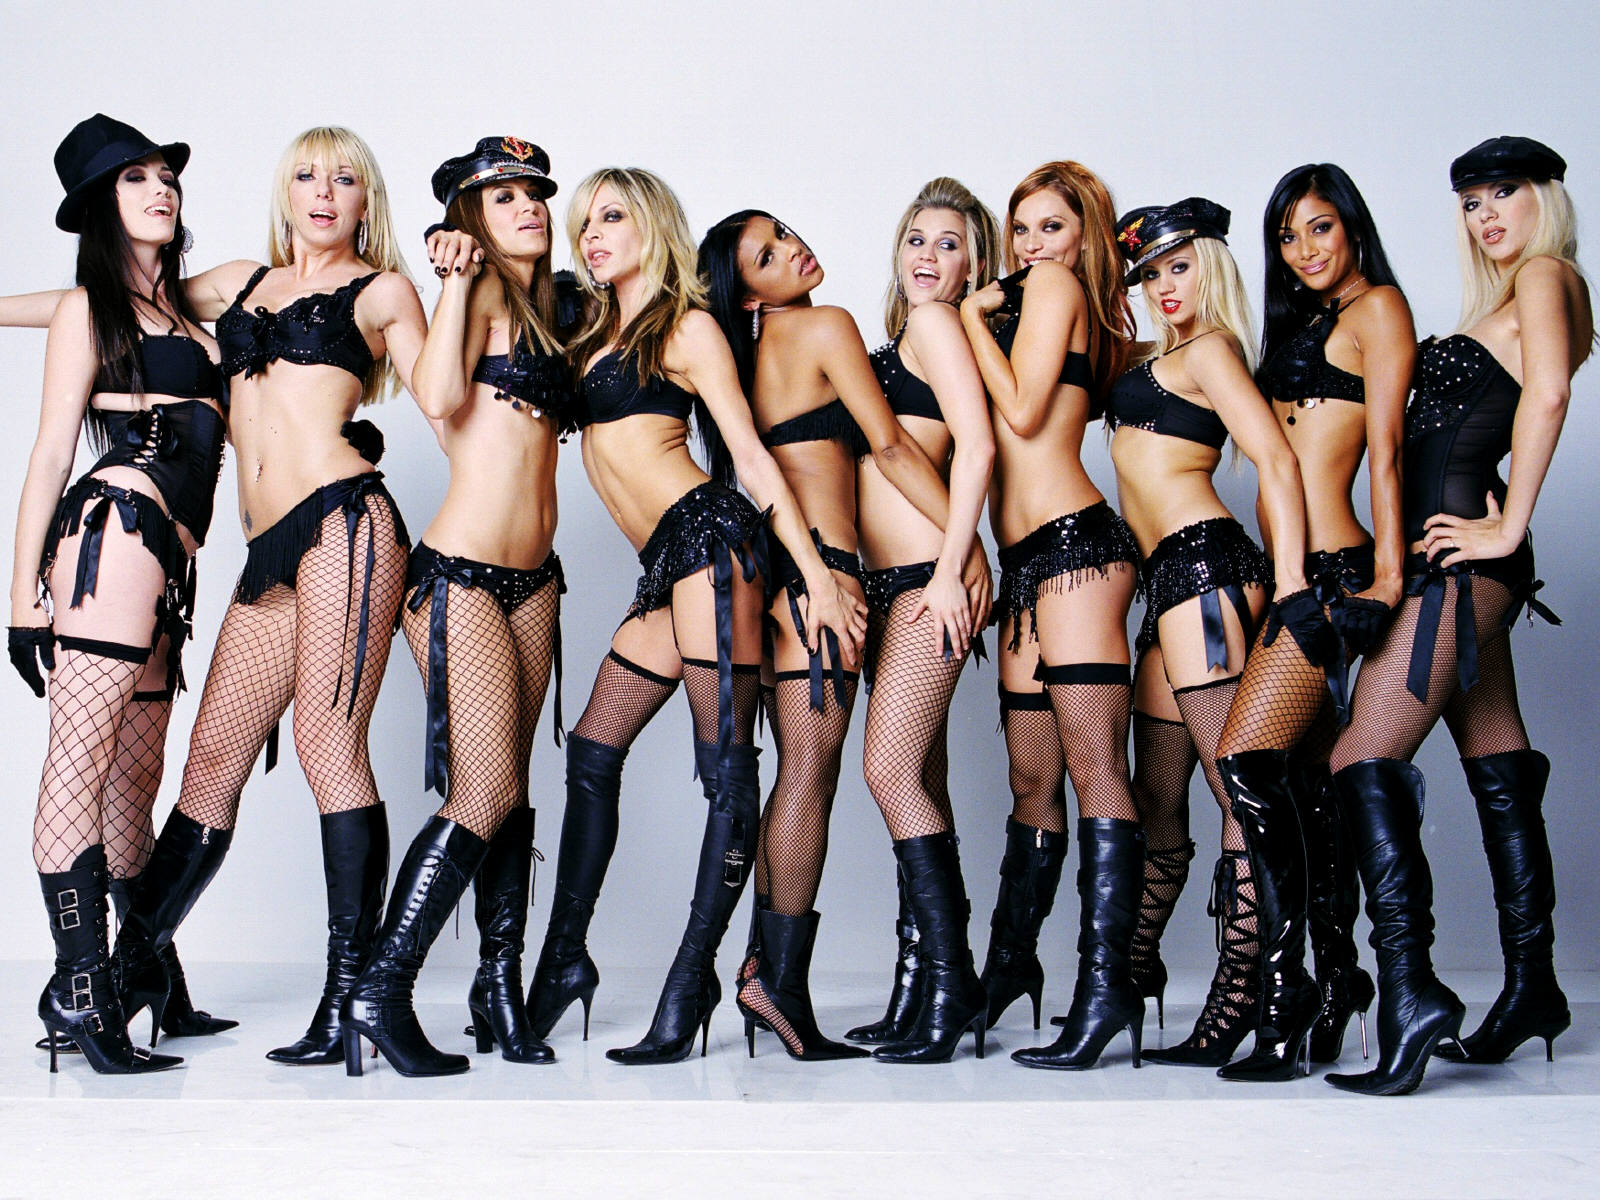 Hot Latina Lesbian Orgy